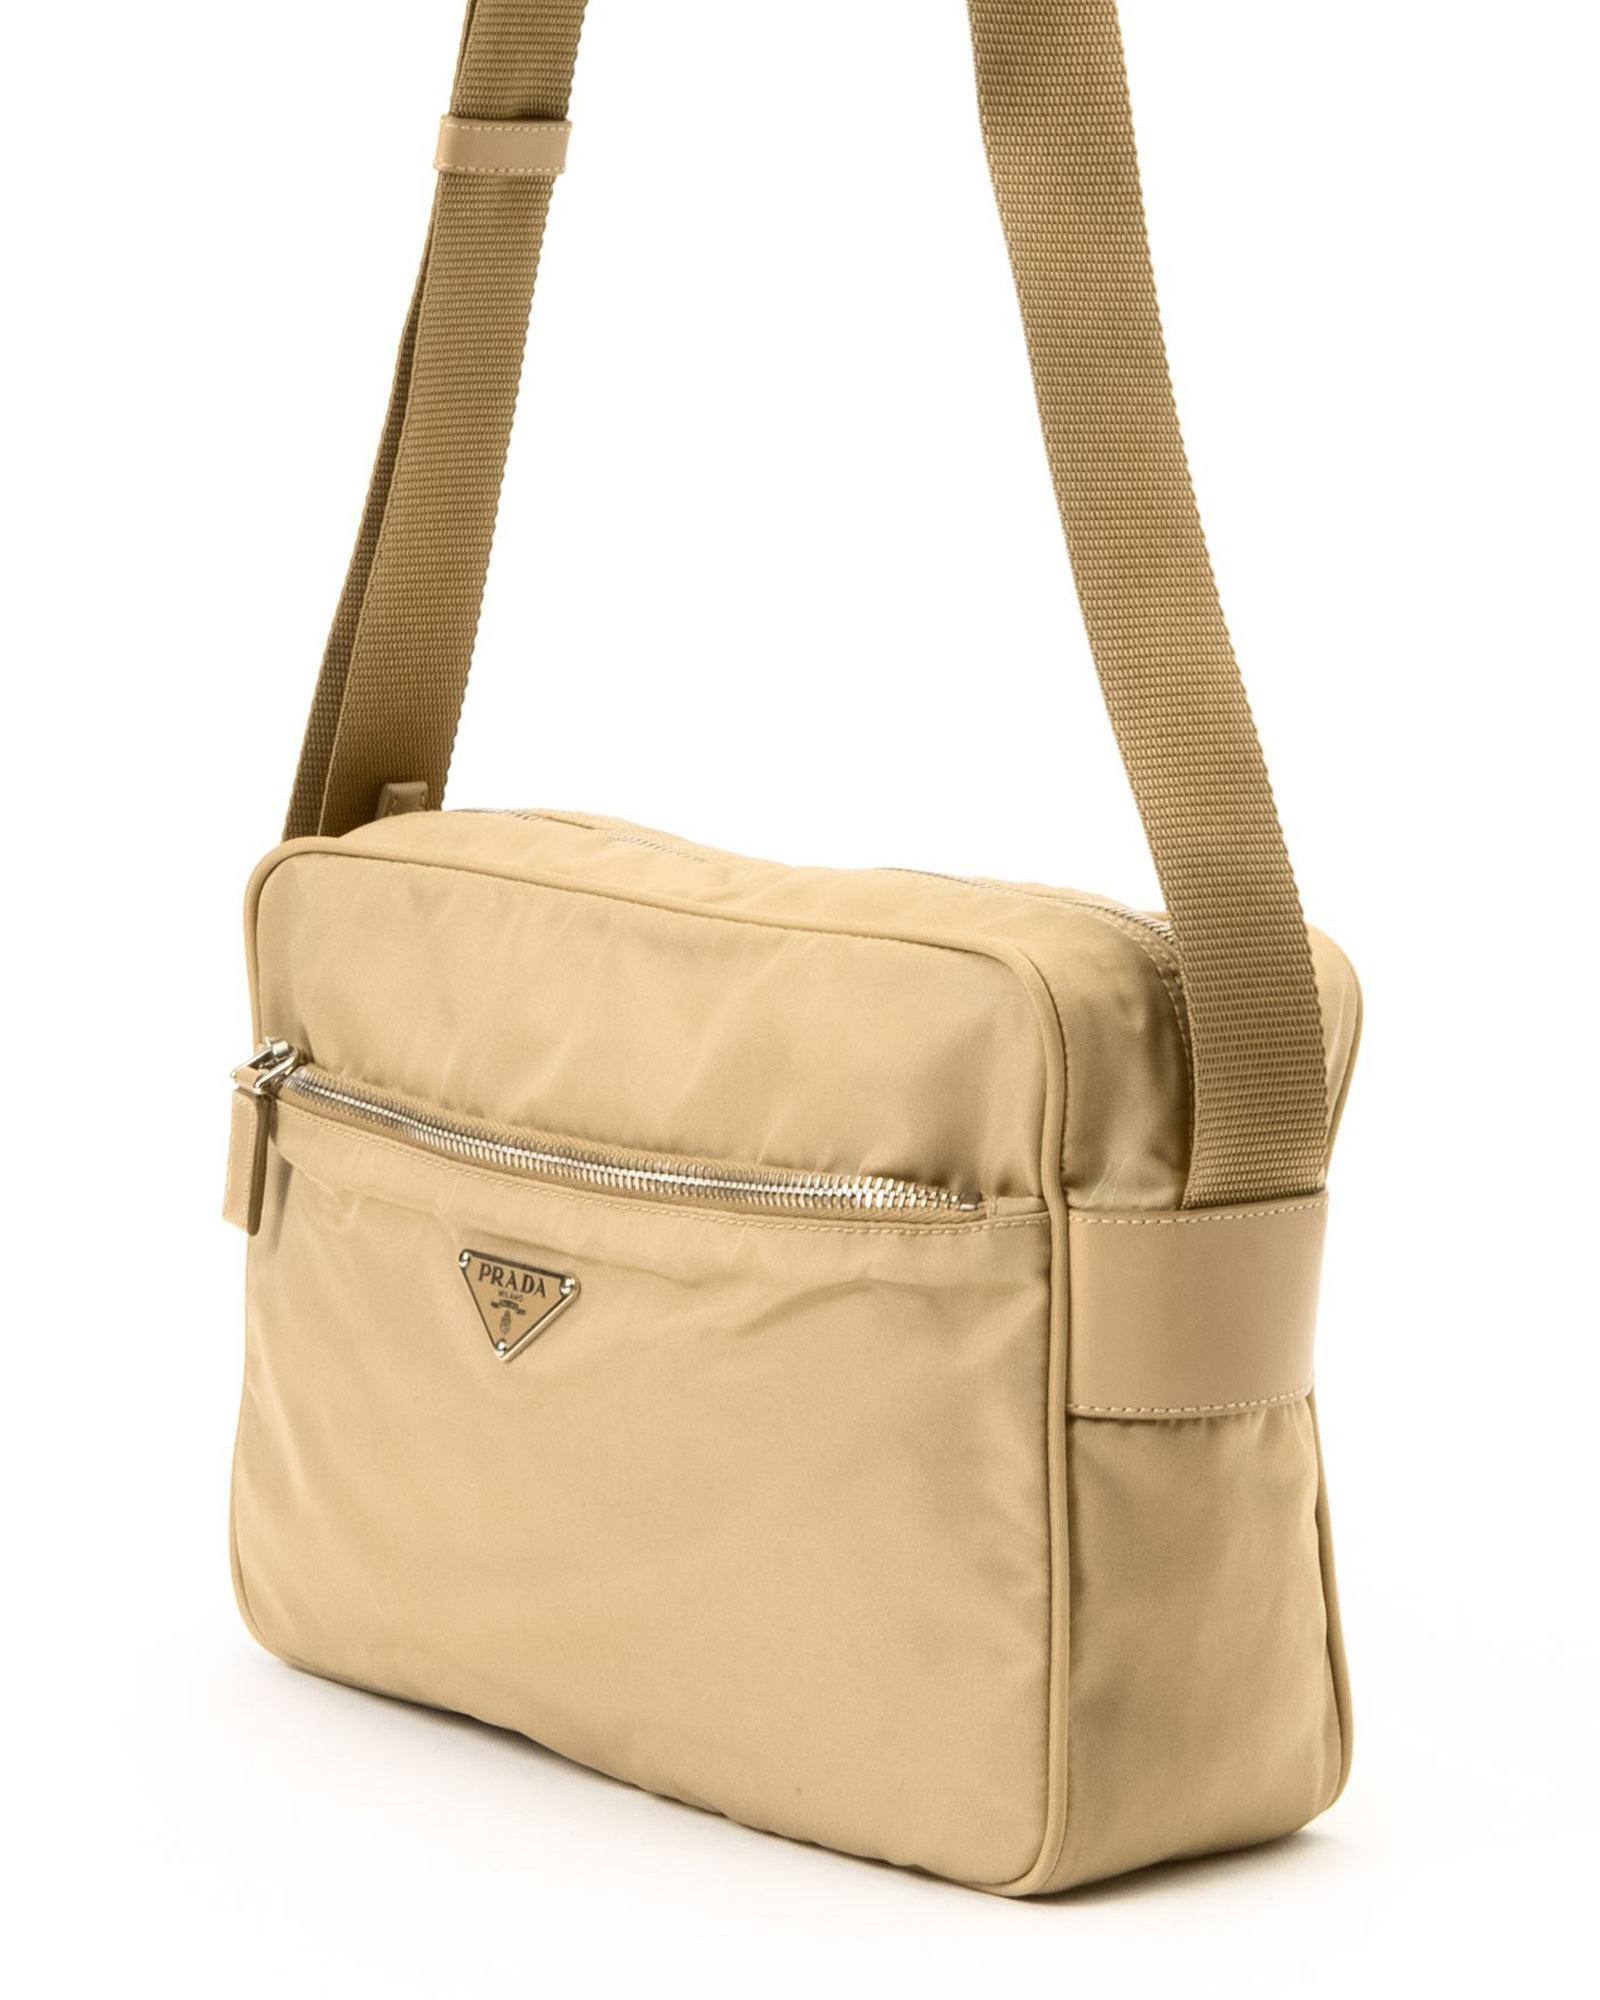 ... low price lyst prada tessuto shoulder bag vintage in natural f367c 7137f e139bfa6d033c